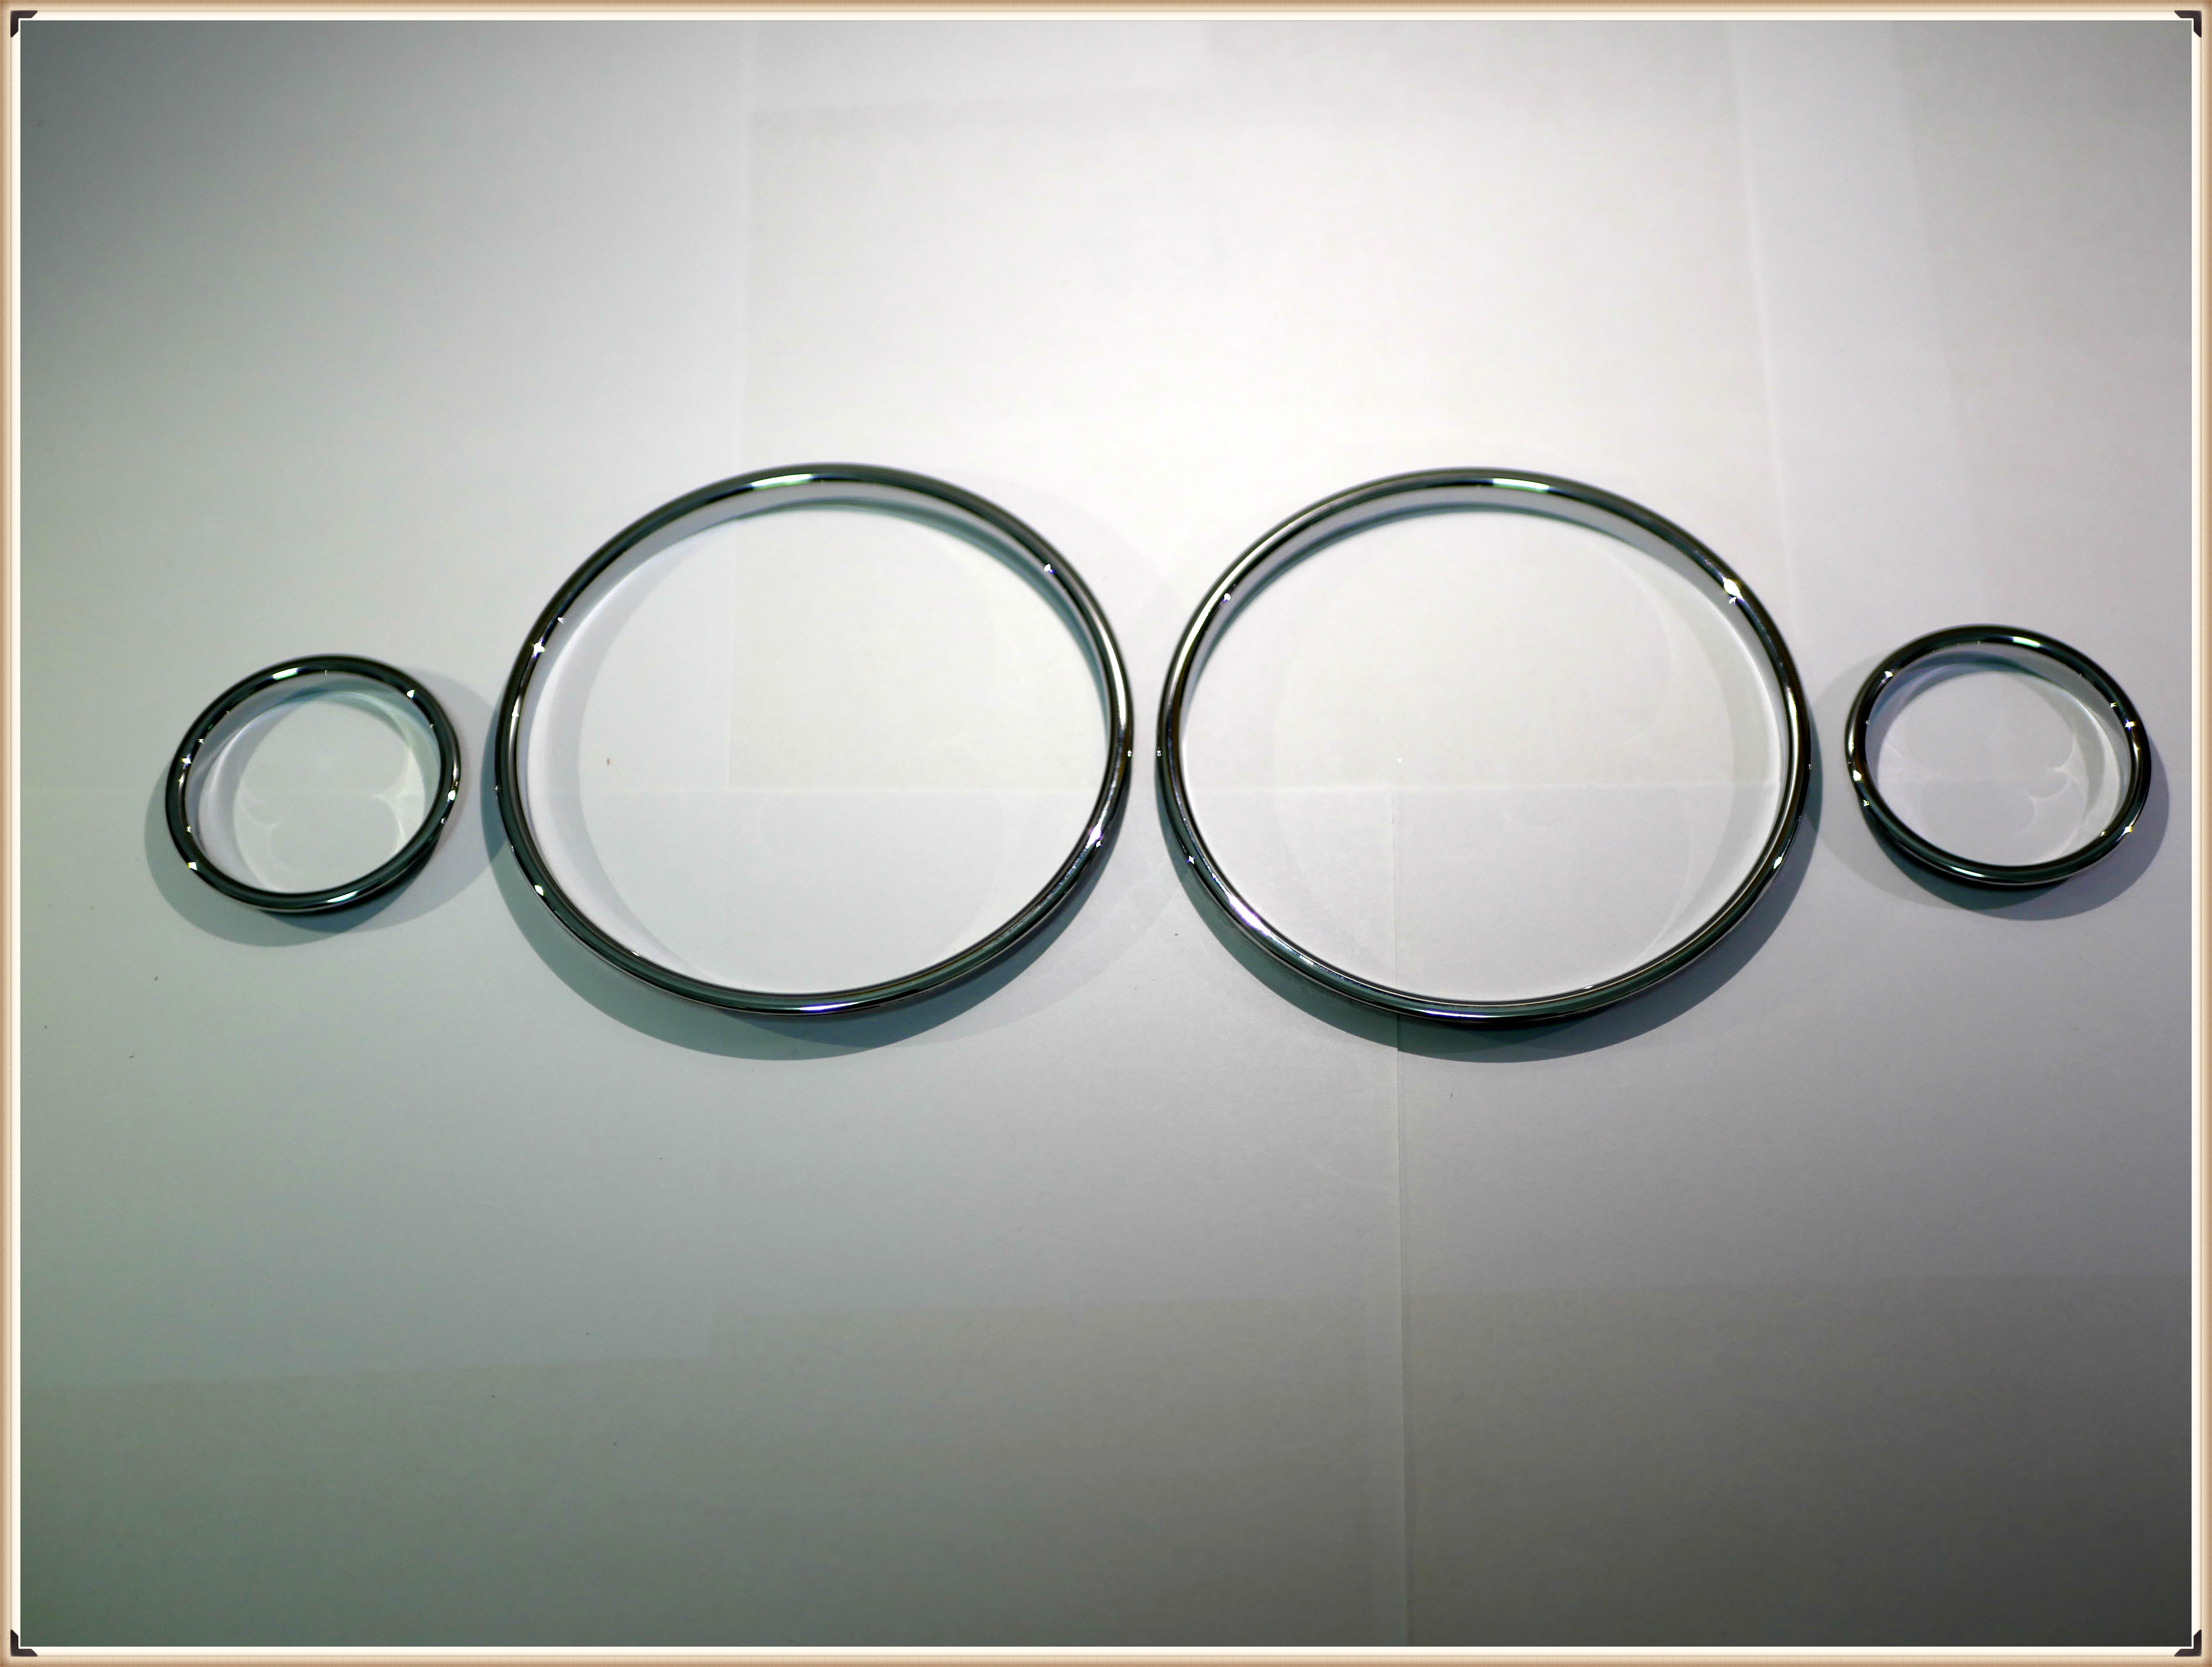 Carbon fiber Cluster Gauge Dash Ring DashBoard fits BMW M Style E38 E39 E53 X5